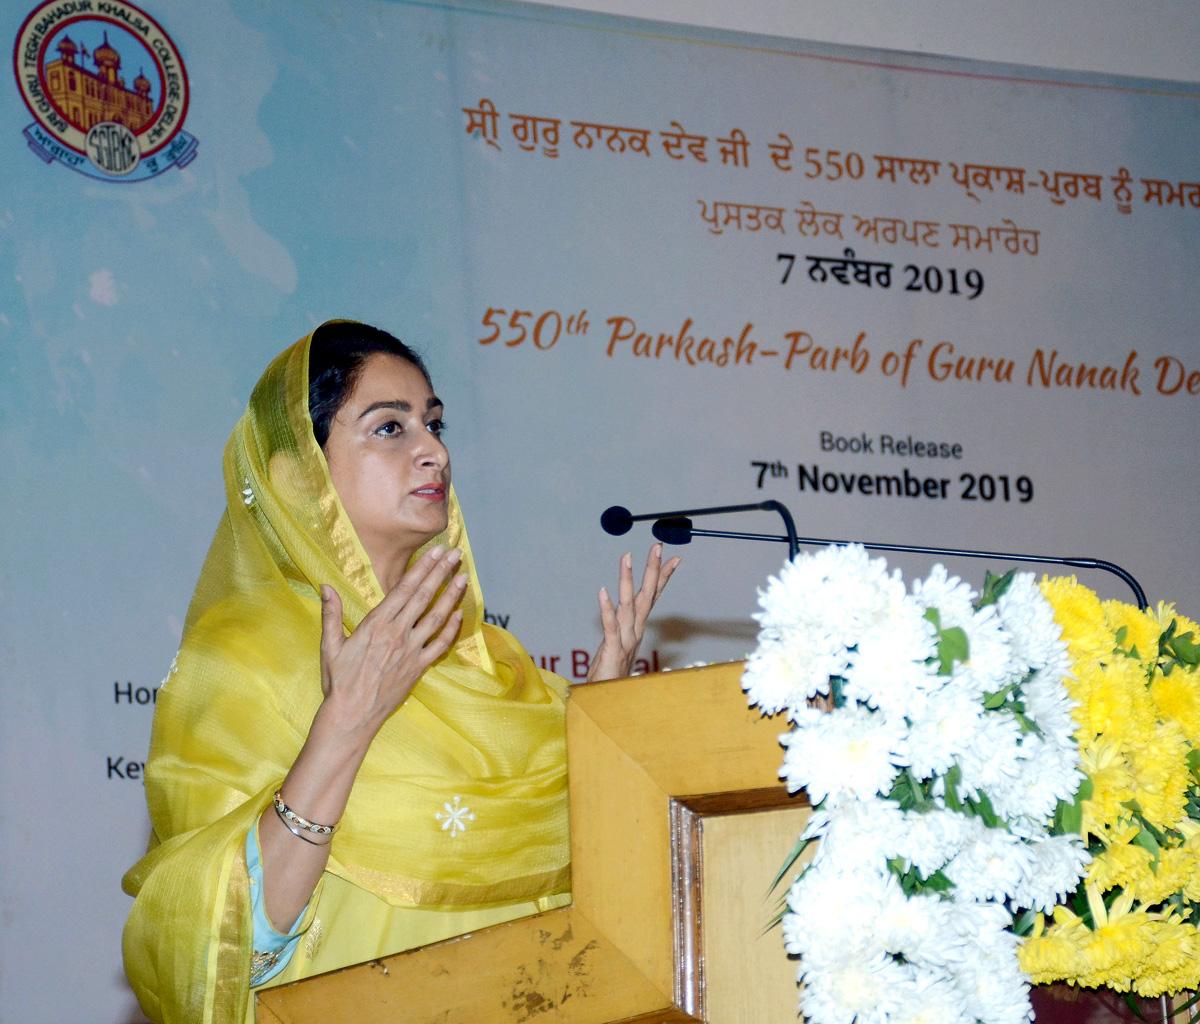 Union Minister for Food Processing Industries, Harsimrat Kaur Badal addressing at the release of the three Books of the National Book Trust on Guru Nanak Ji, on the occasion of 550th Birth Anniversary of Guru Nanak Dev Ji, in New Delhi on Thursday.